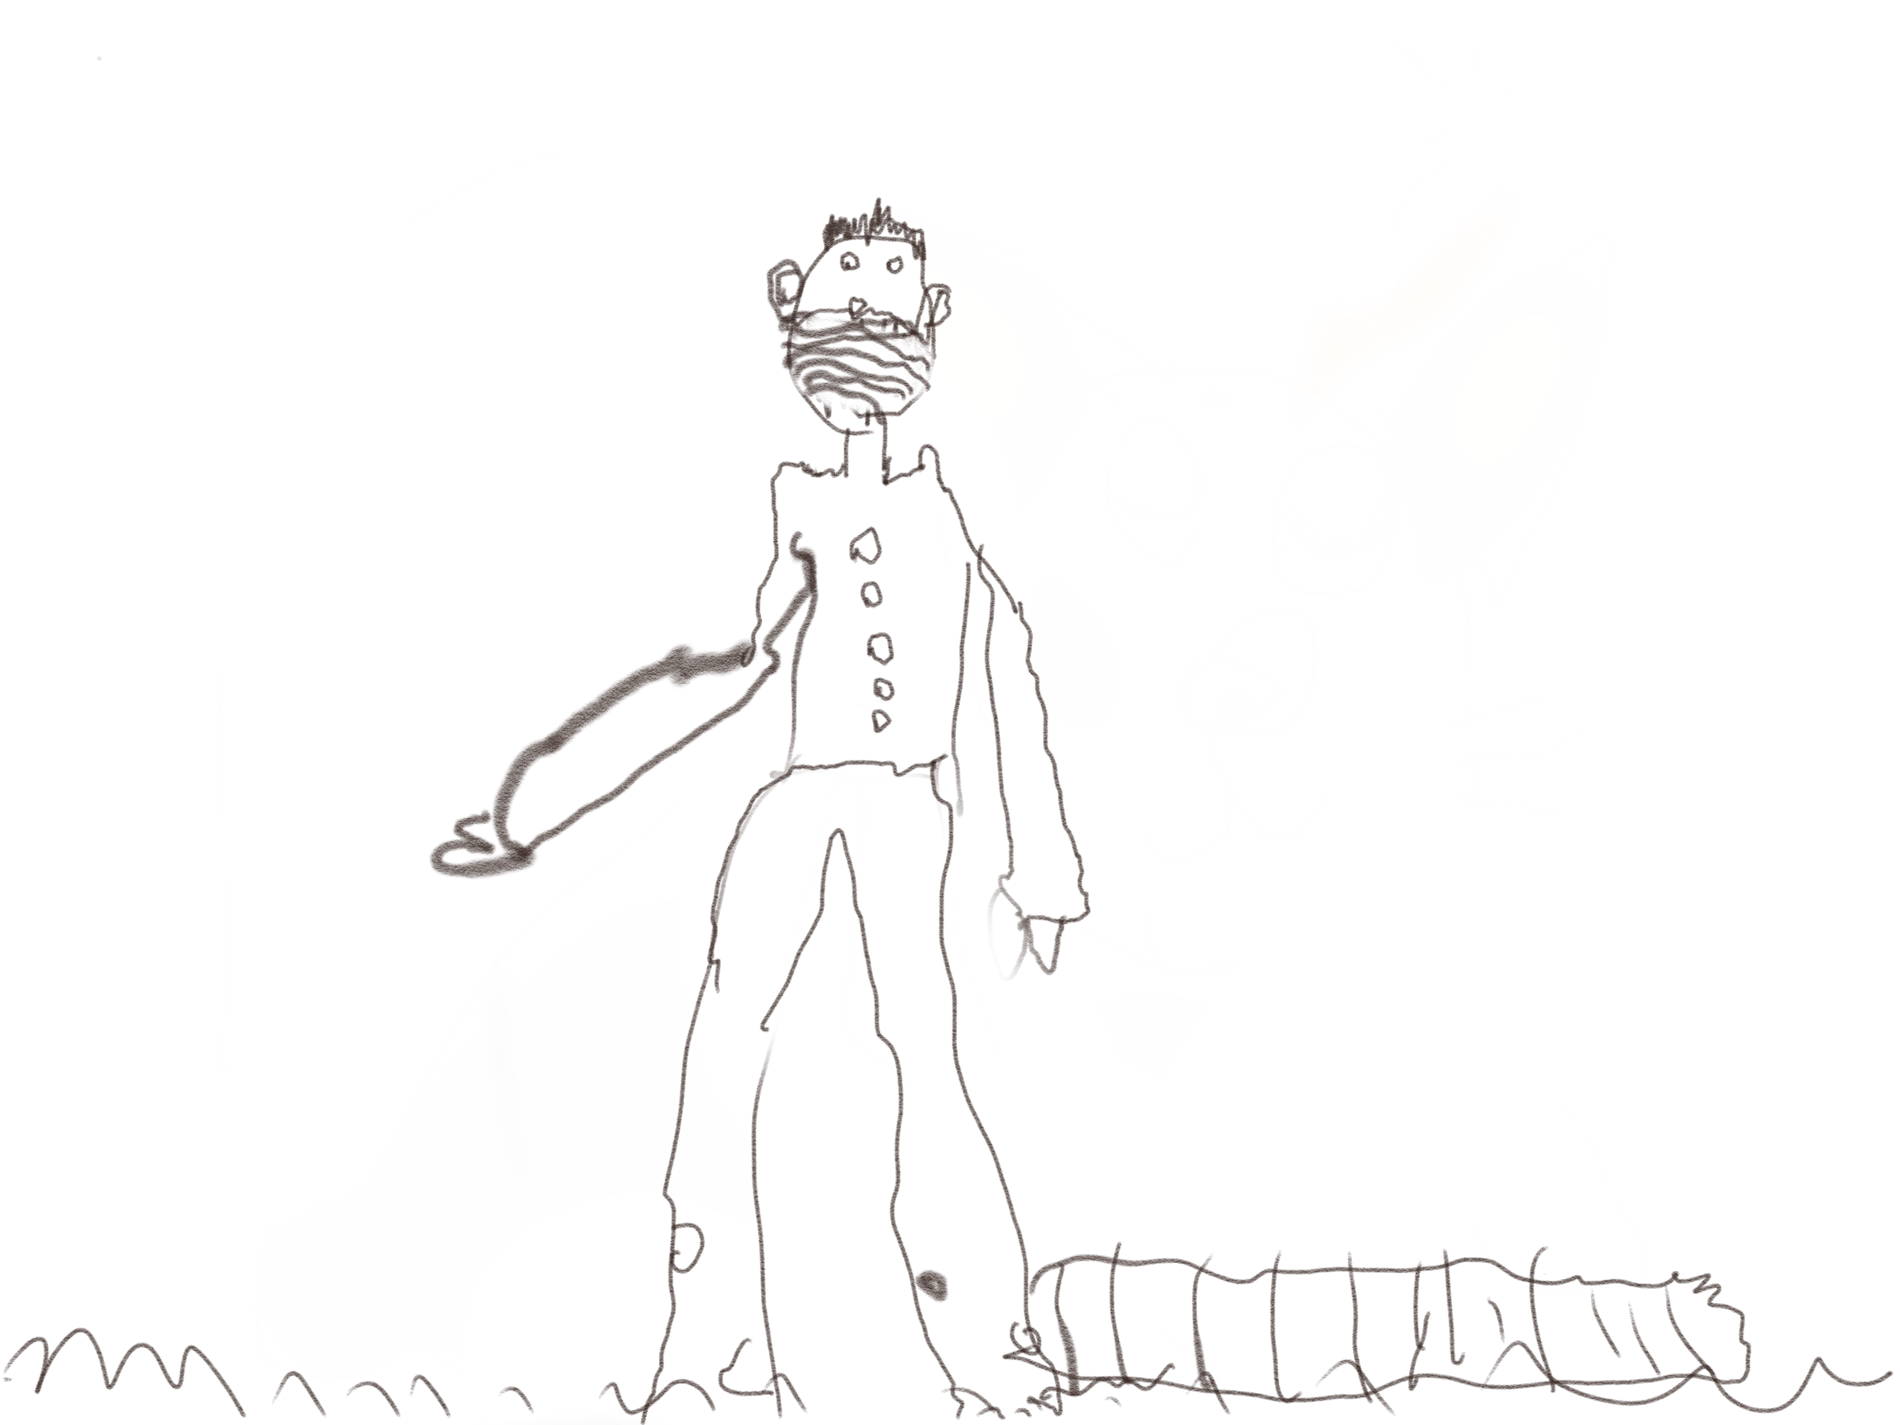 Digital Drawing for WEEK 10 (1st Grade)